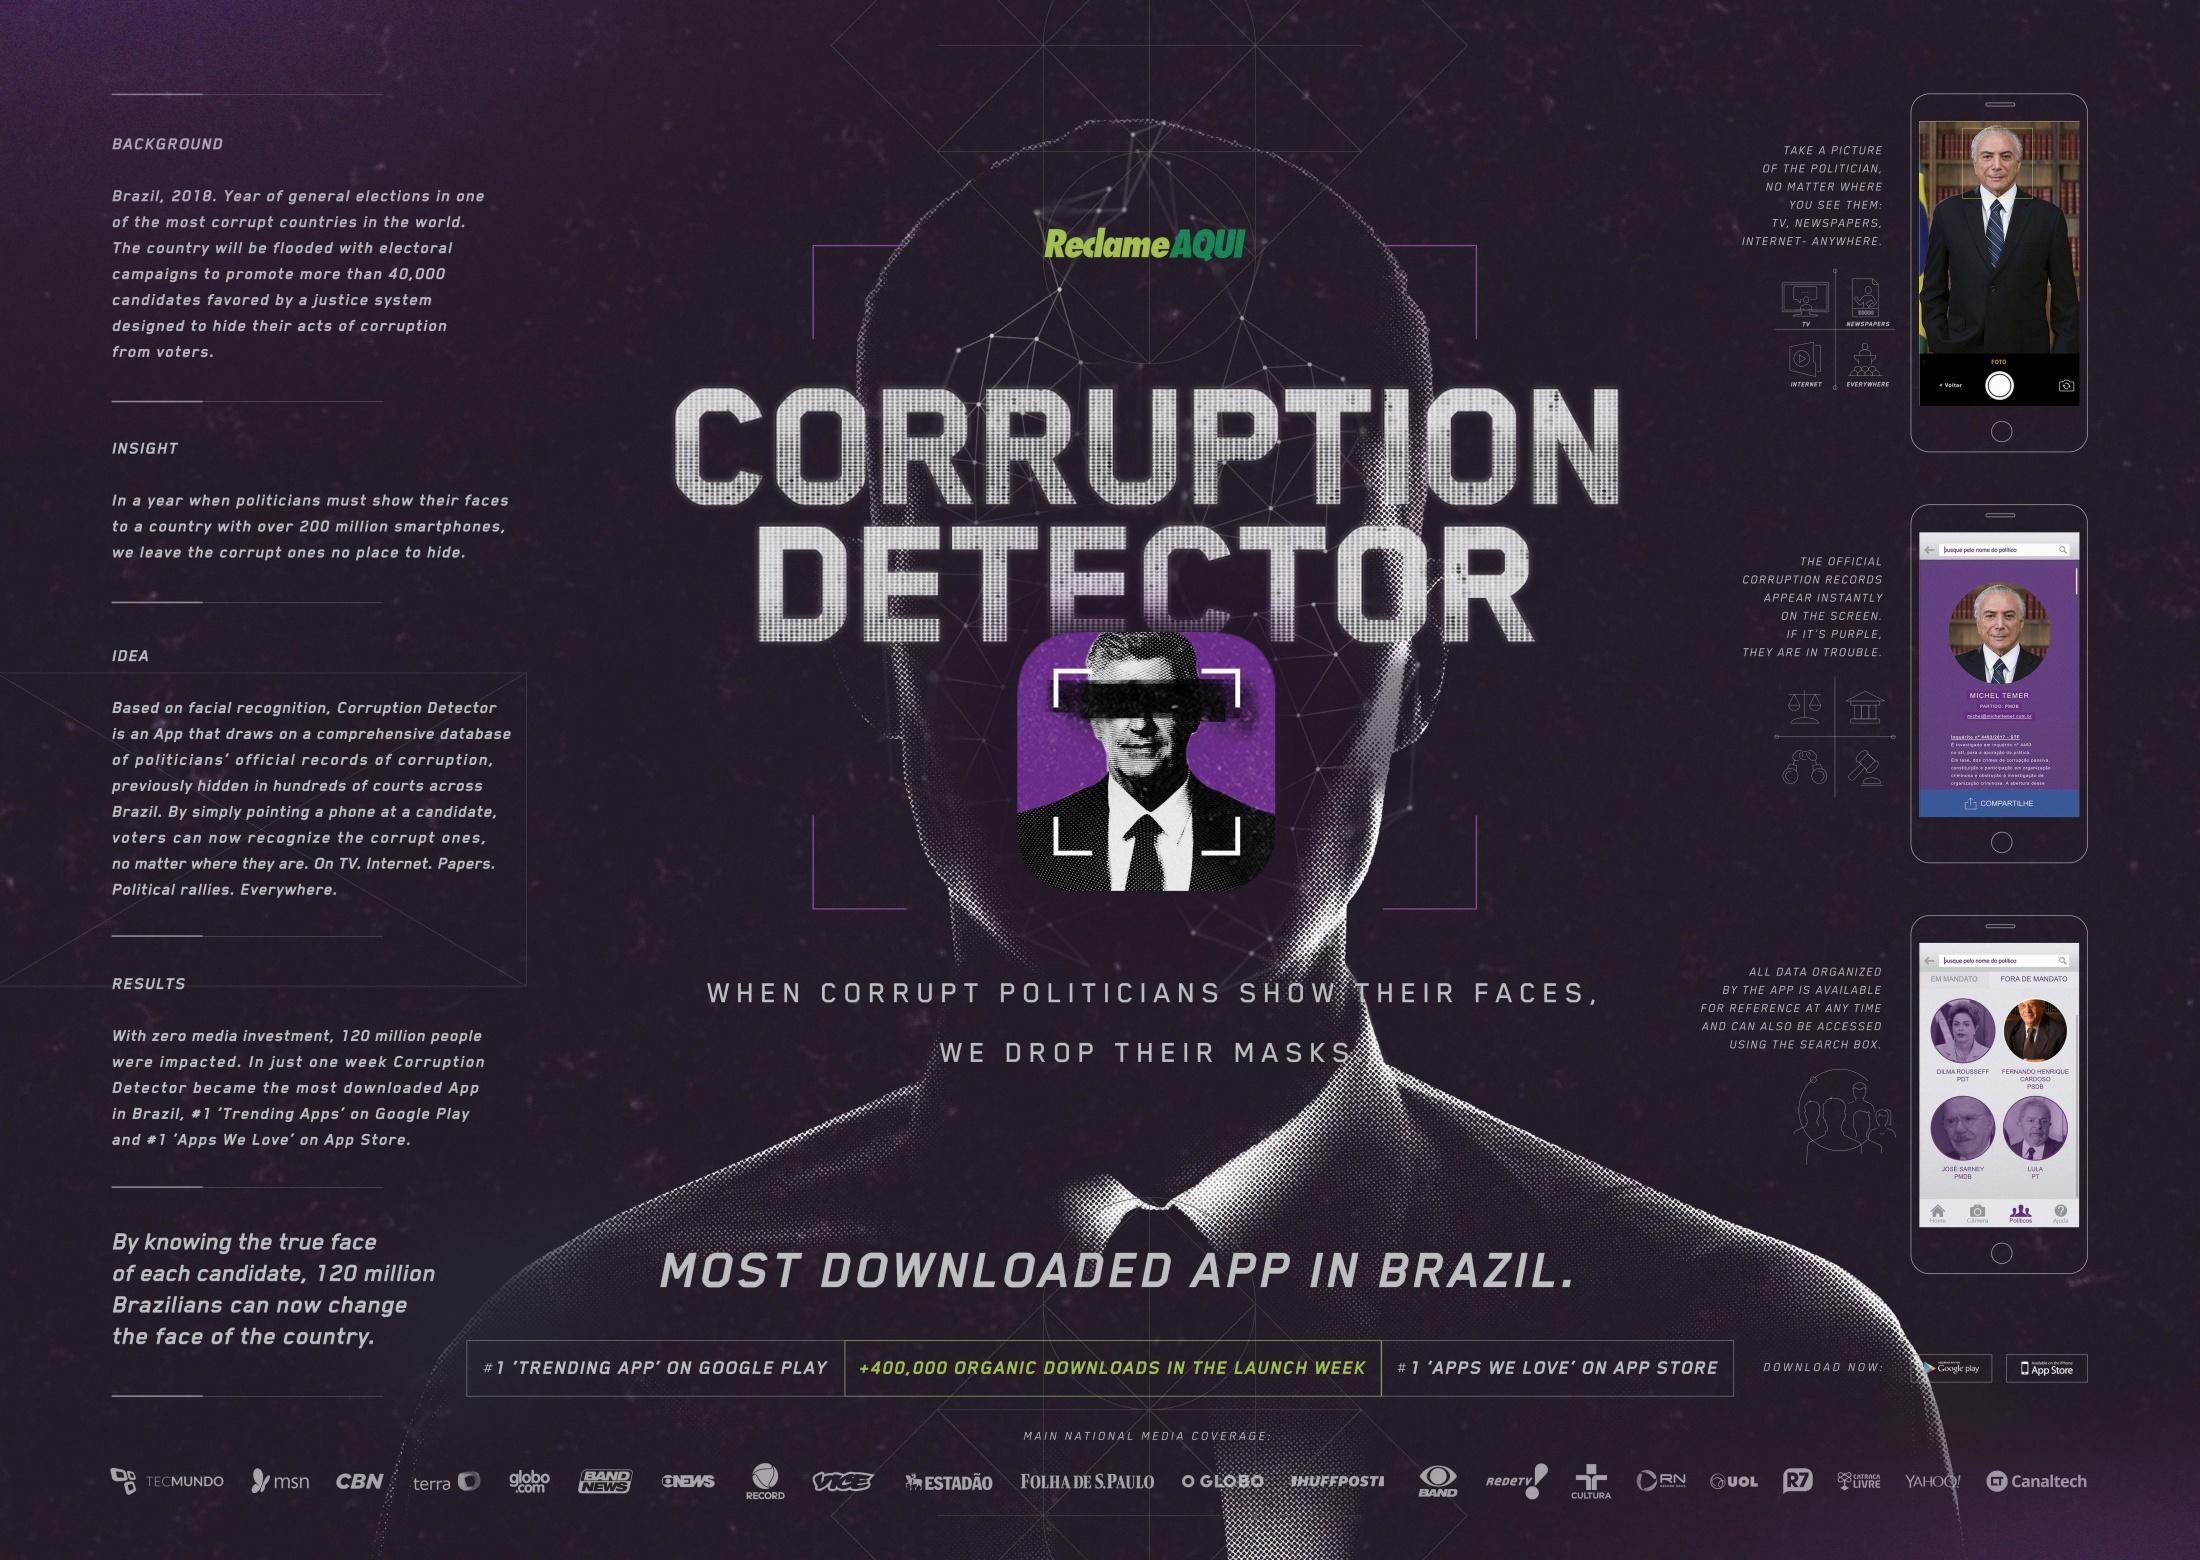 Thumbnail for CORRUPTION DETECTOR